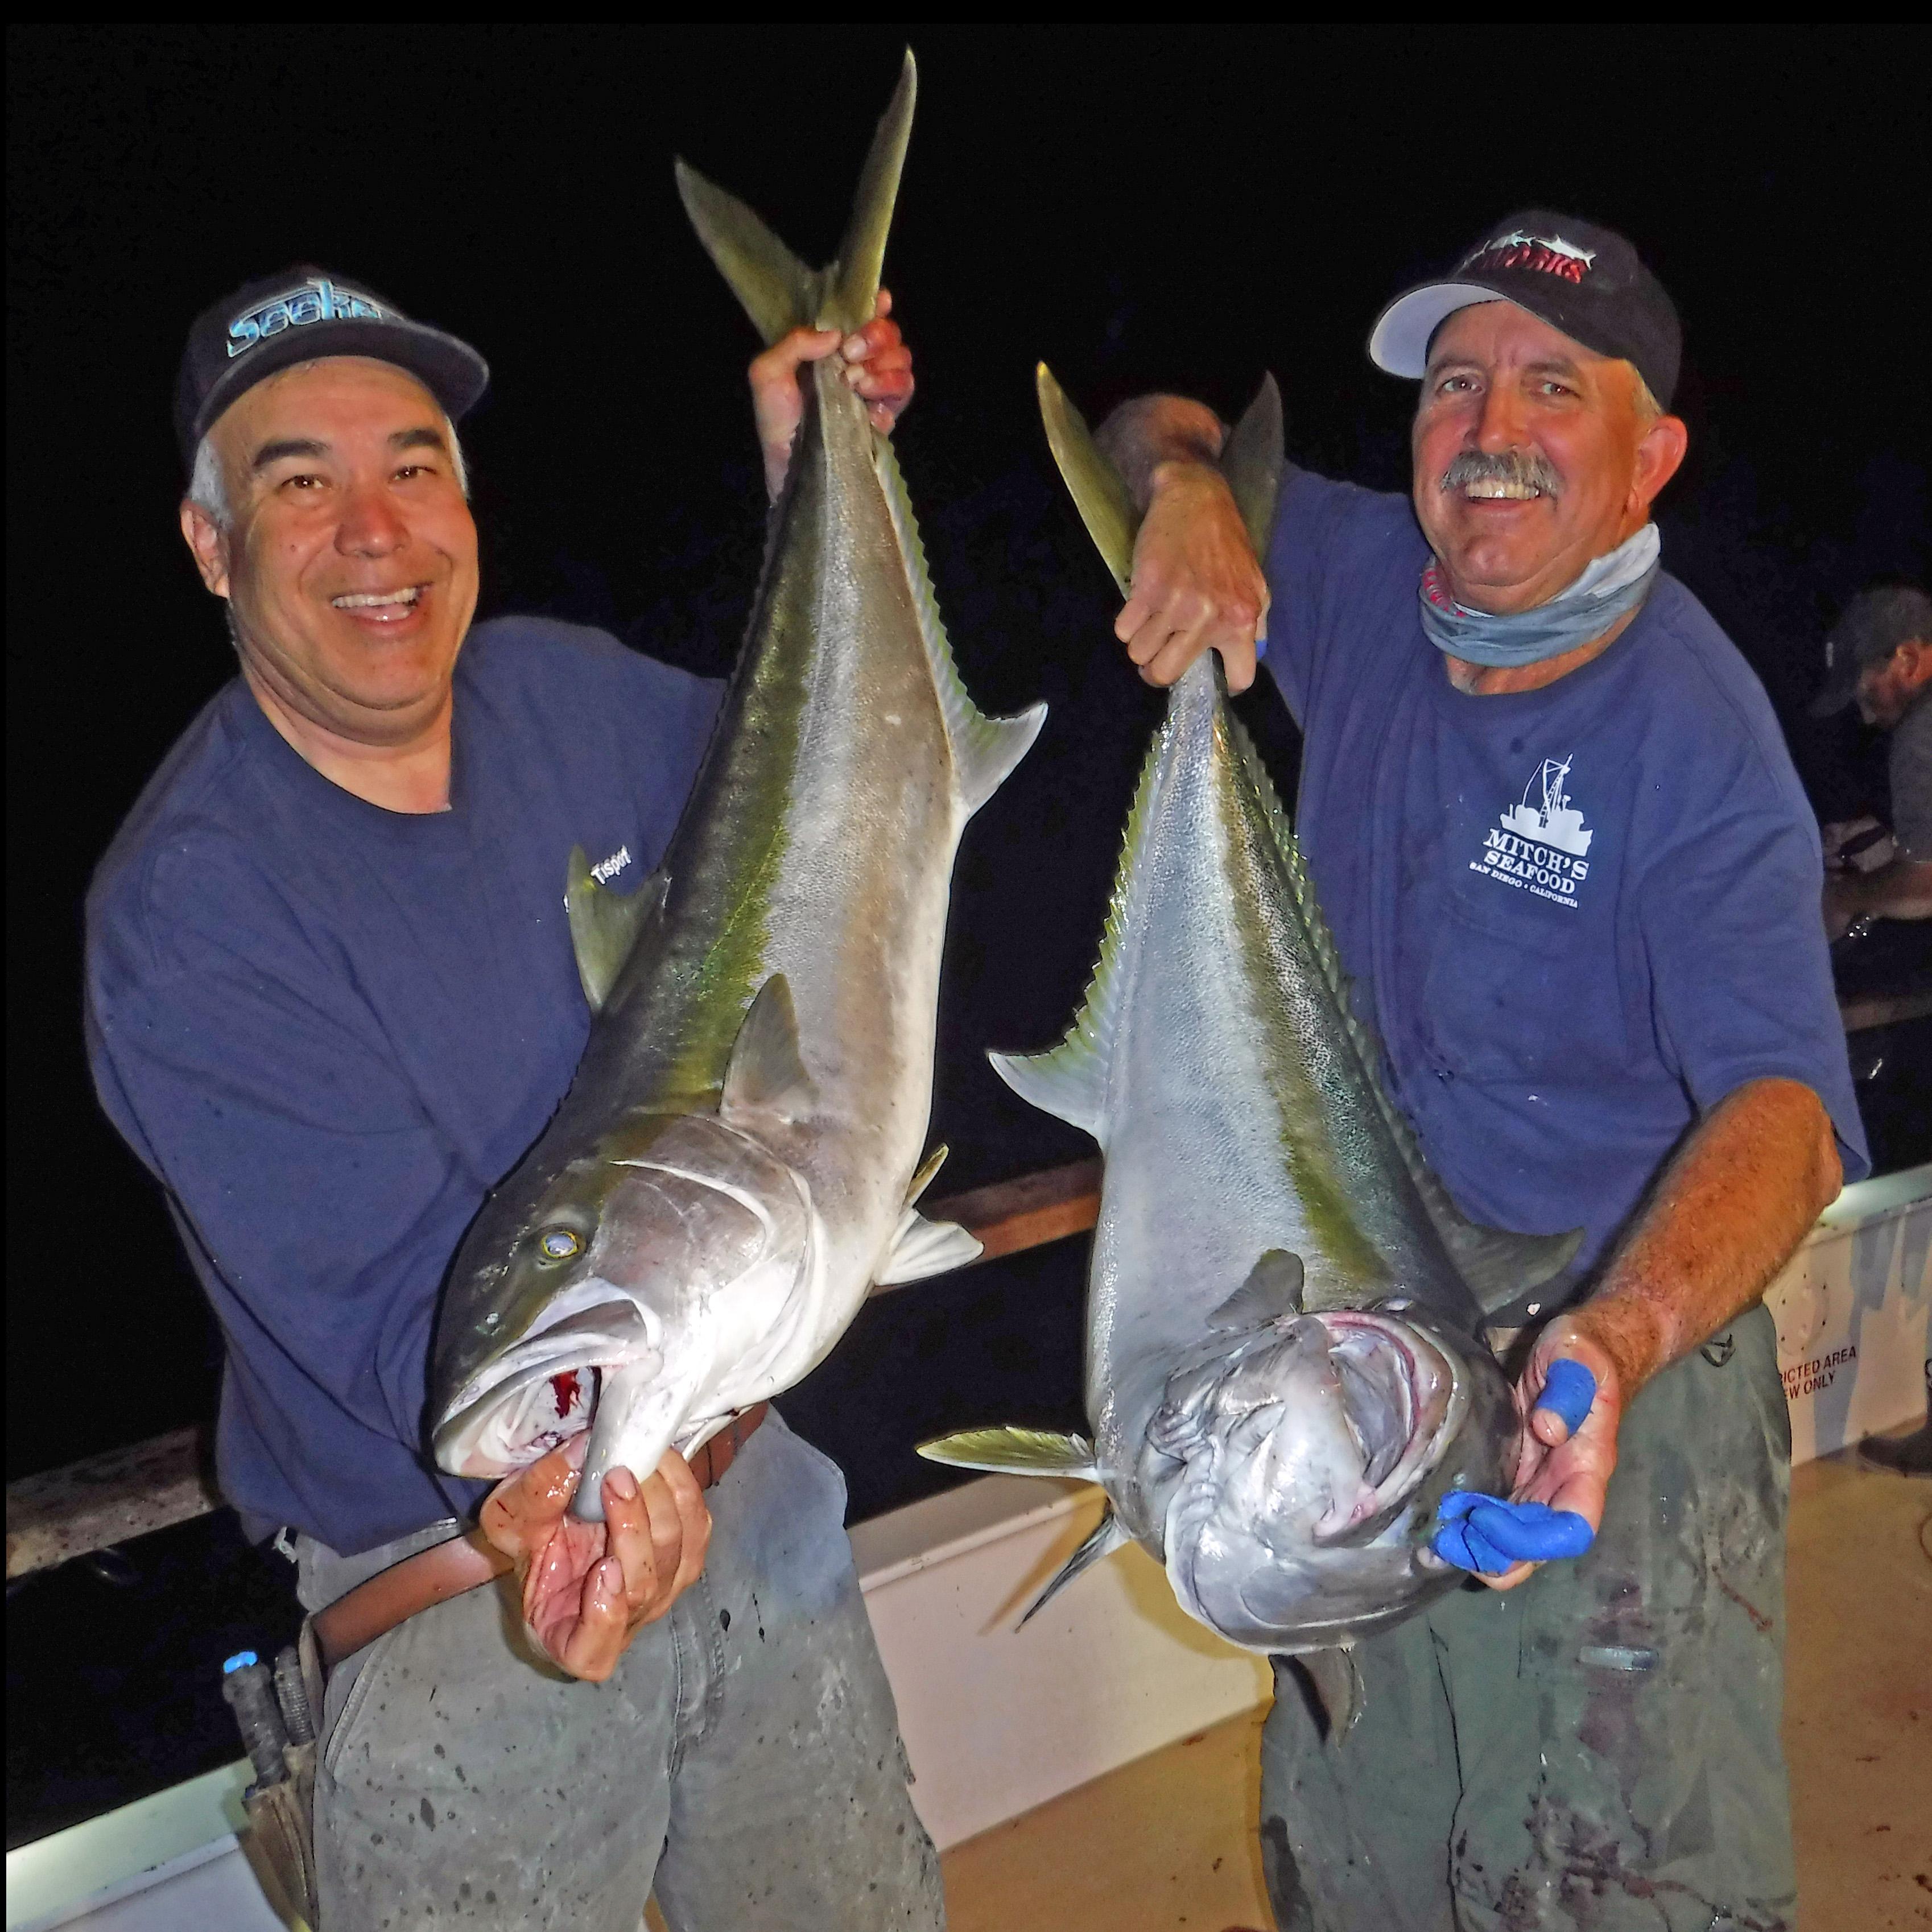 ED AND JOHN DSCF7389.jpg